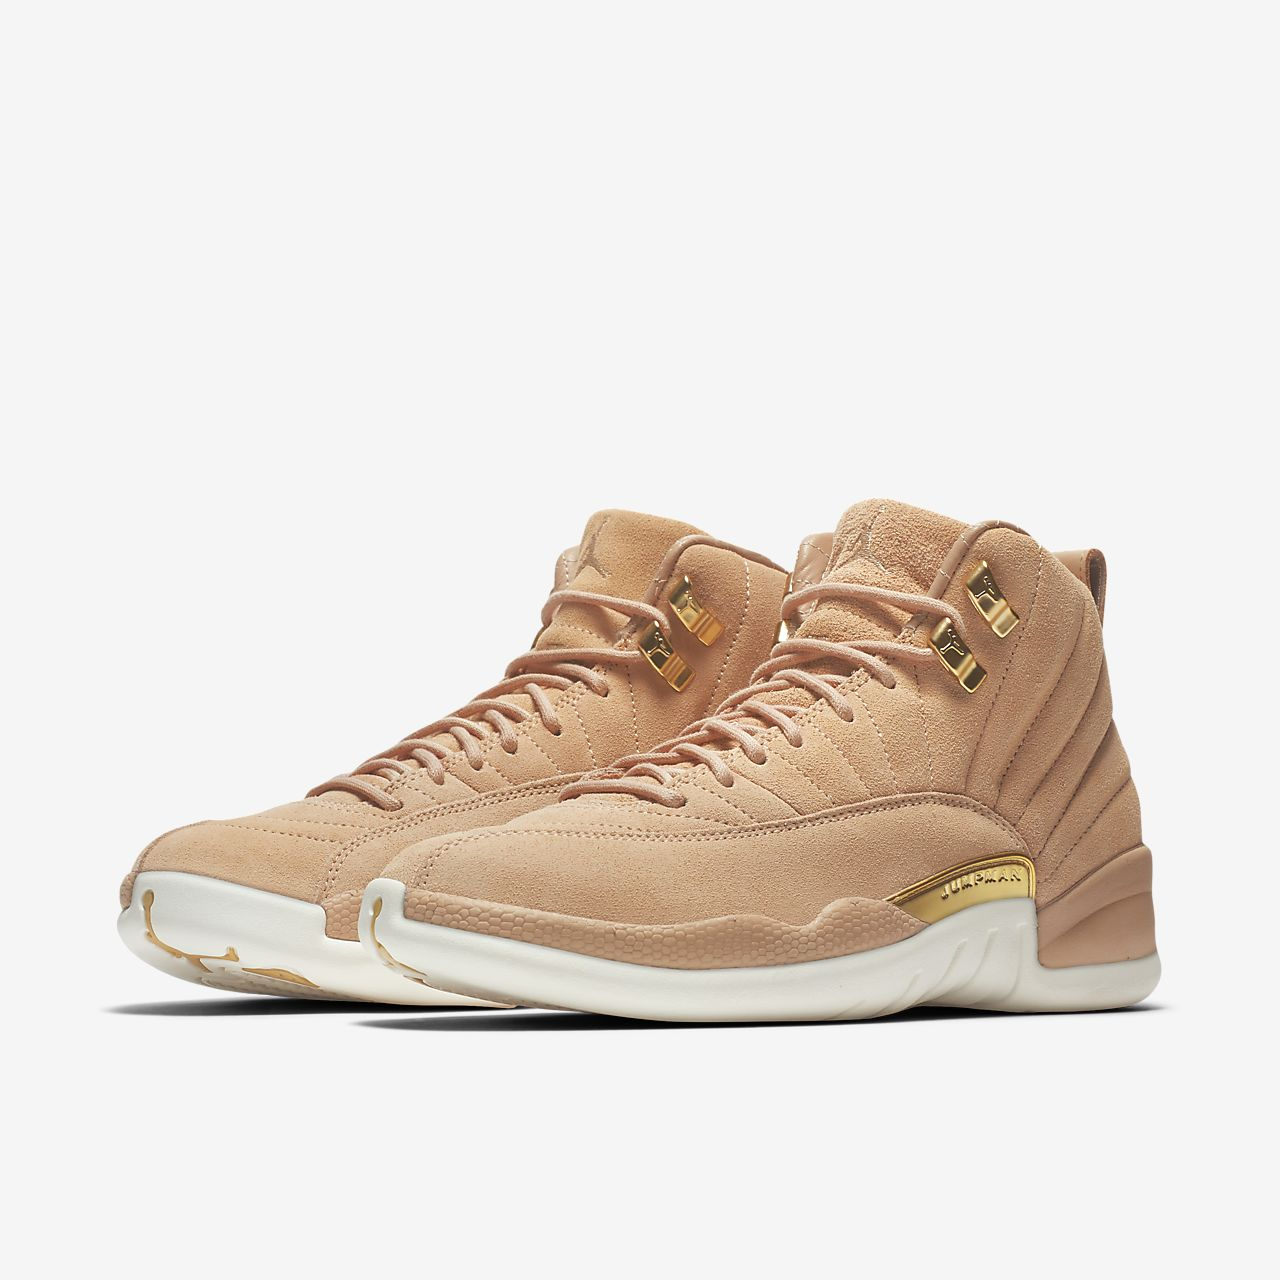 Low Resolution Air Jordan 12 Retro Women\u0027s Shoe Air Jordan 12 Retro Women\u0027s  Shoe